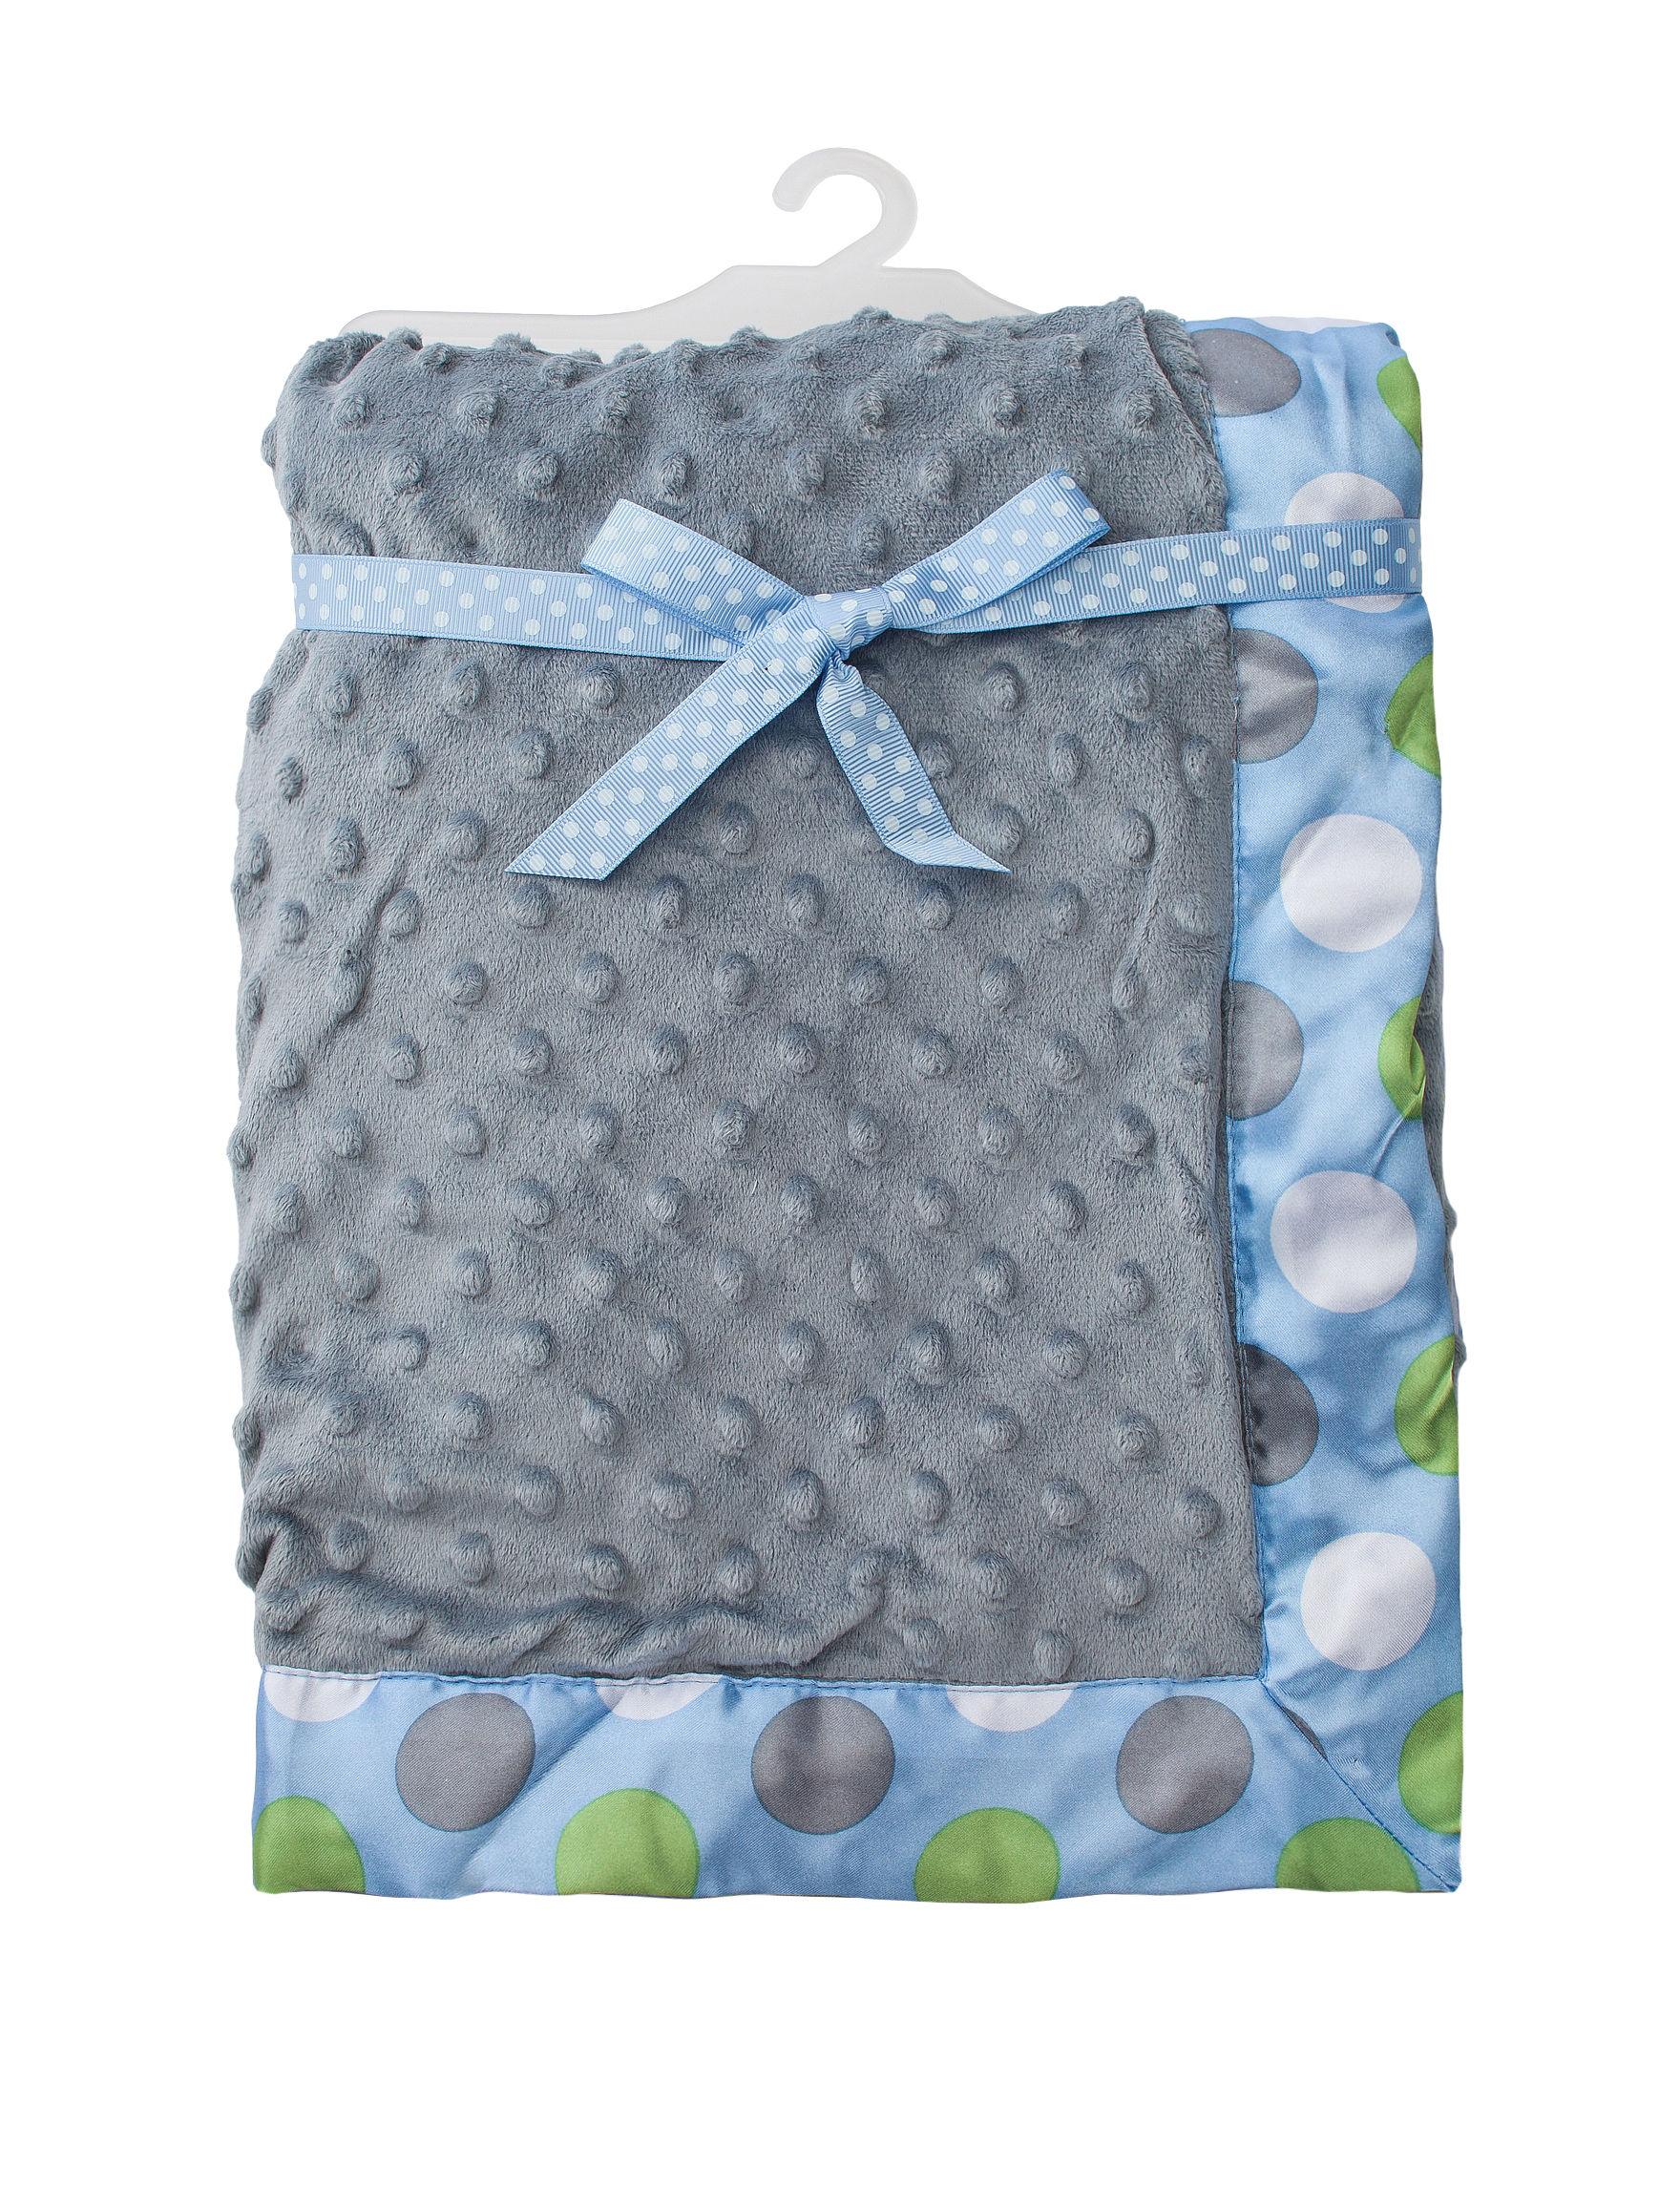 Baby Essentials Grey